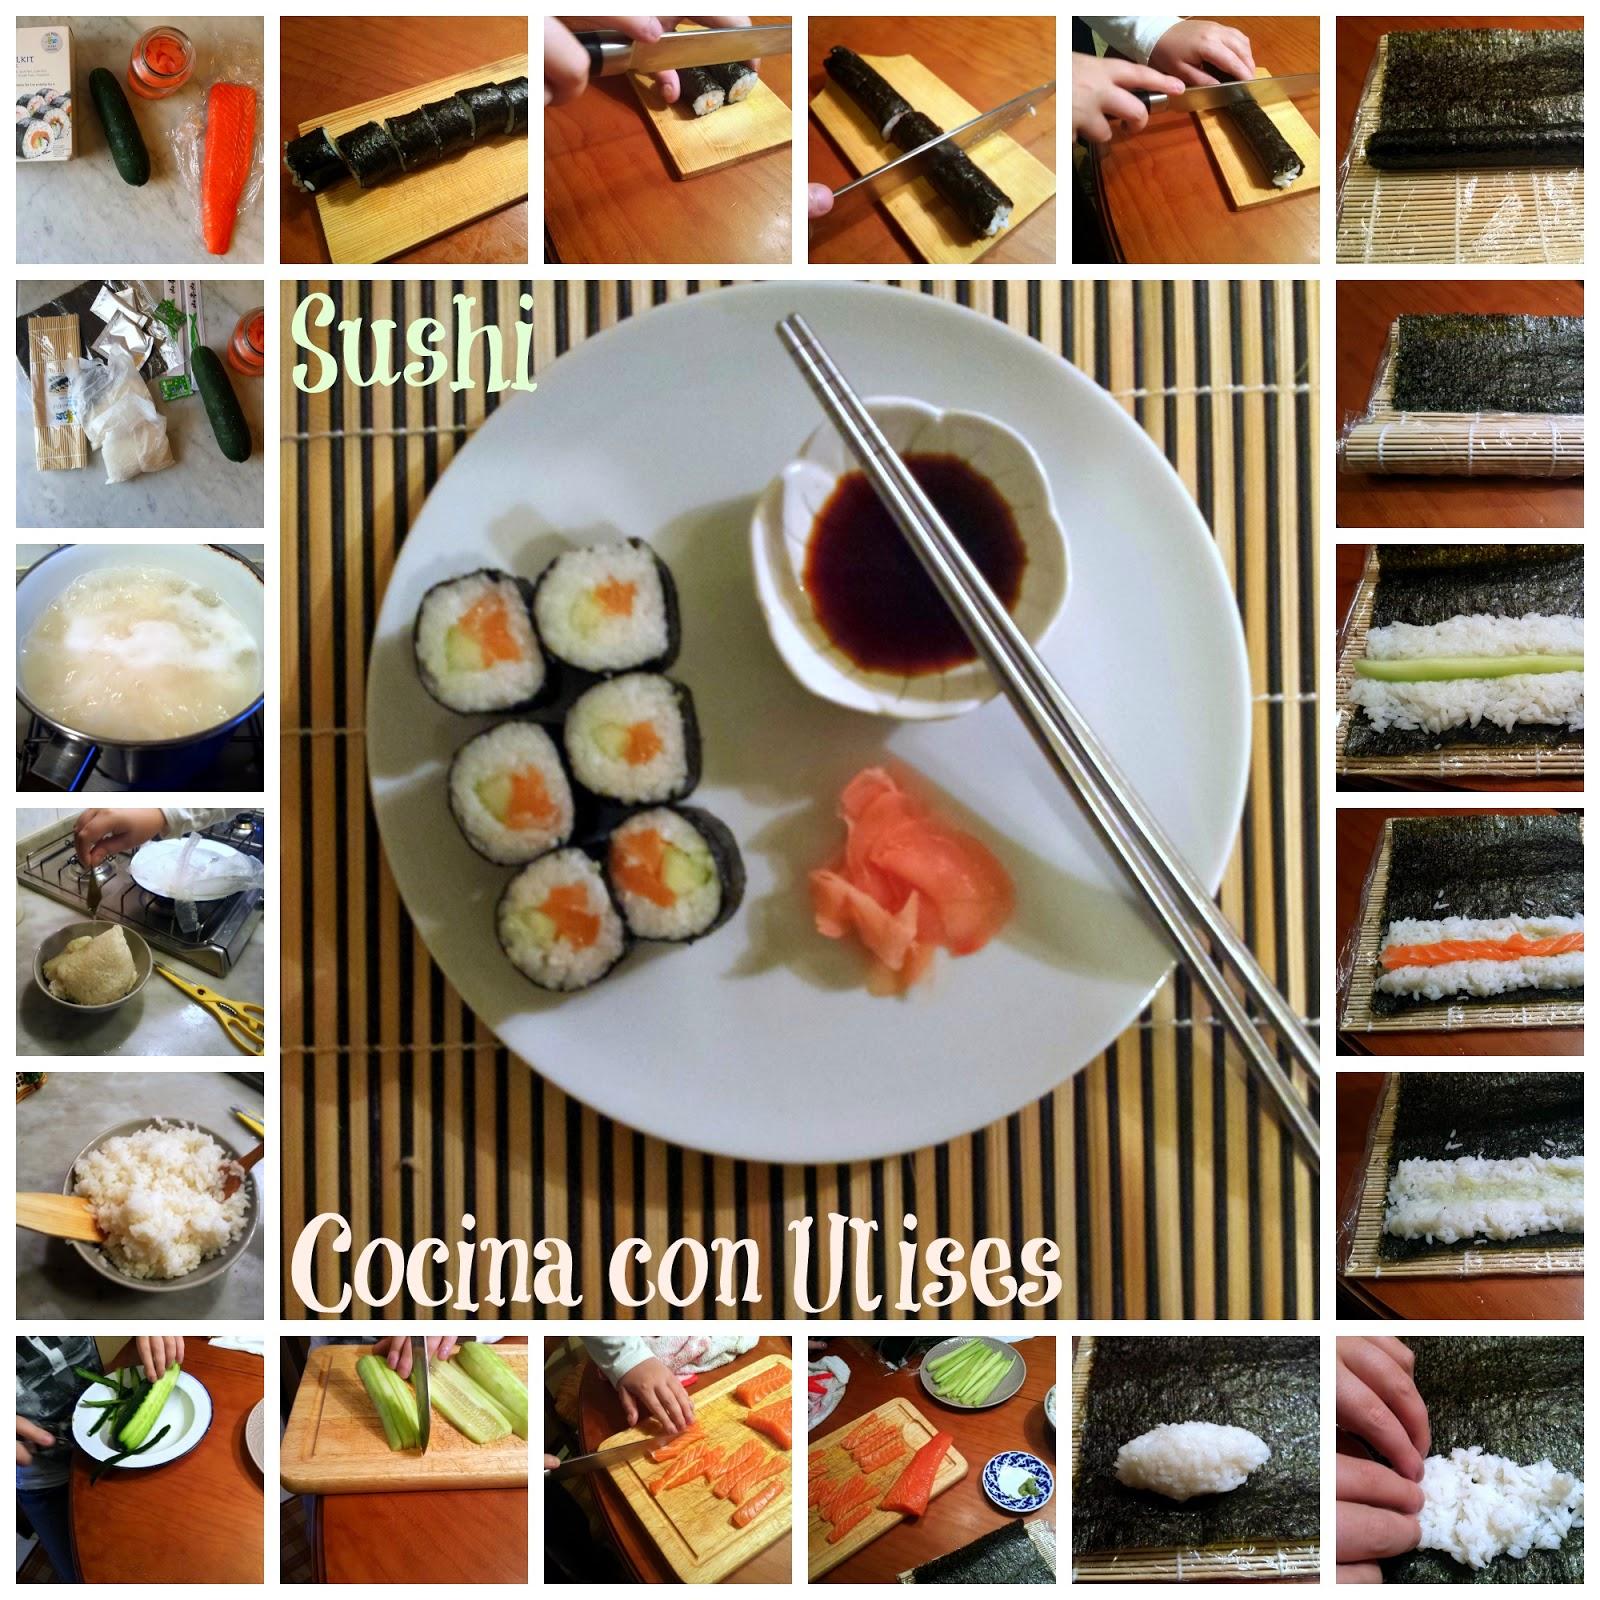 http://elfestindemarga.blogspot.com.es/2014/06/sushi-maki-de-salmon-cocina-con-ulises.html